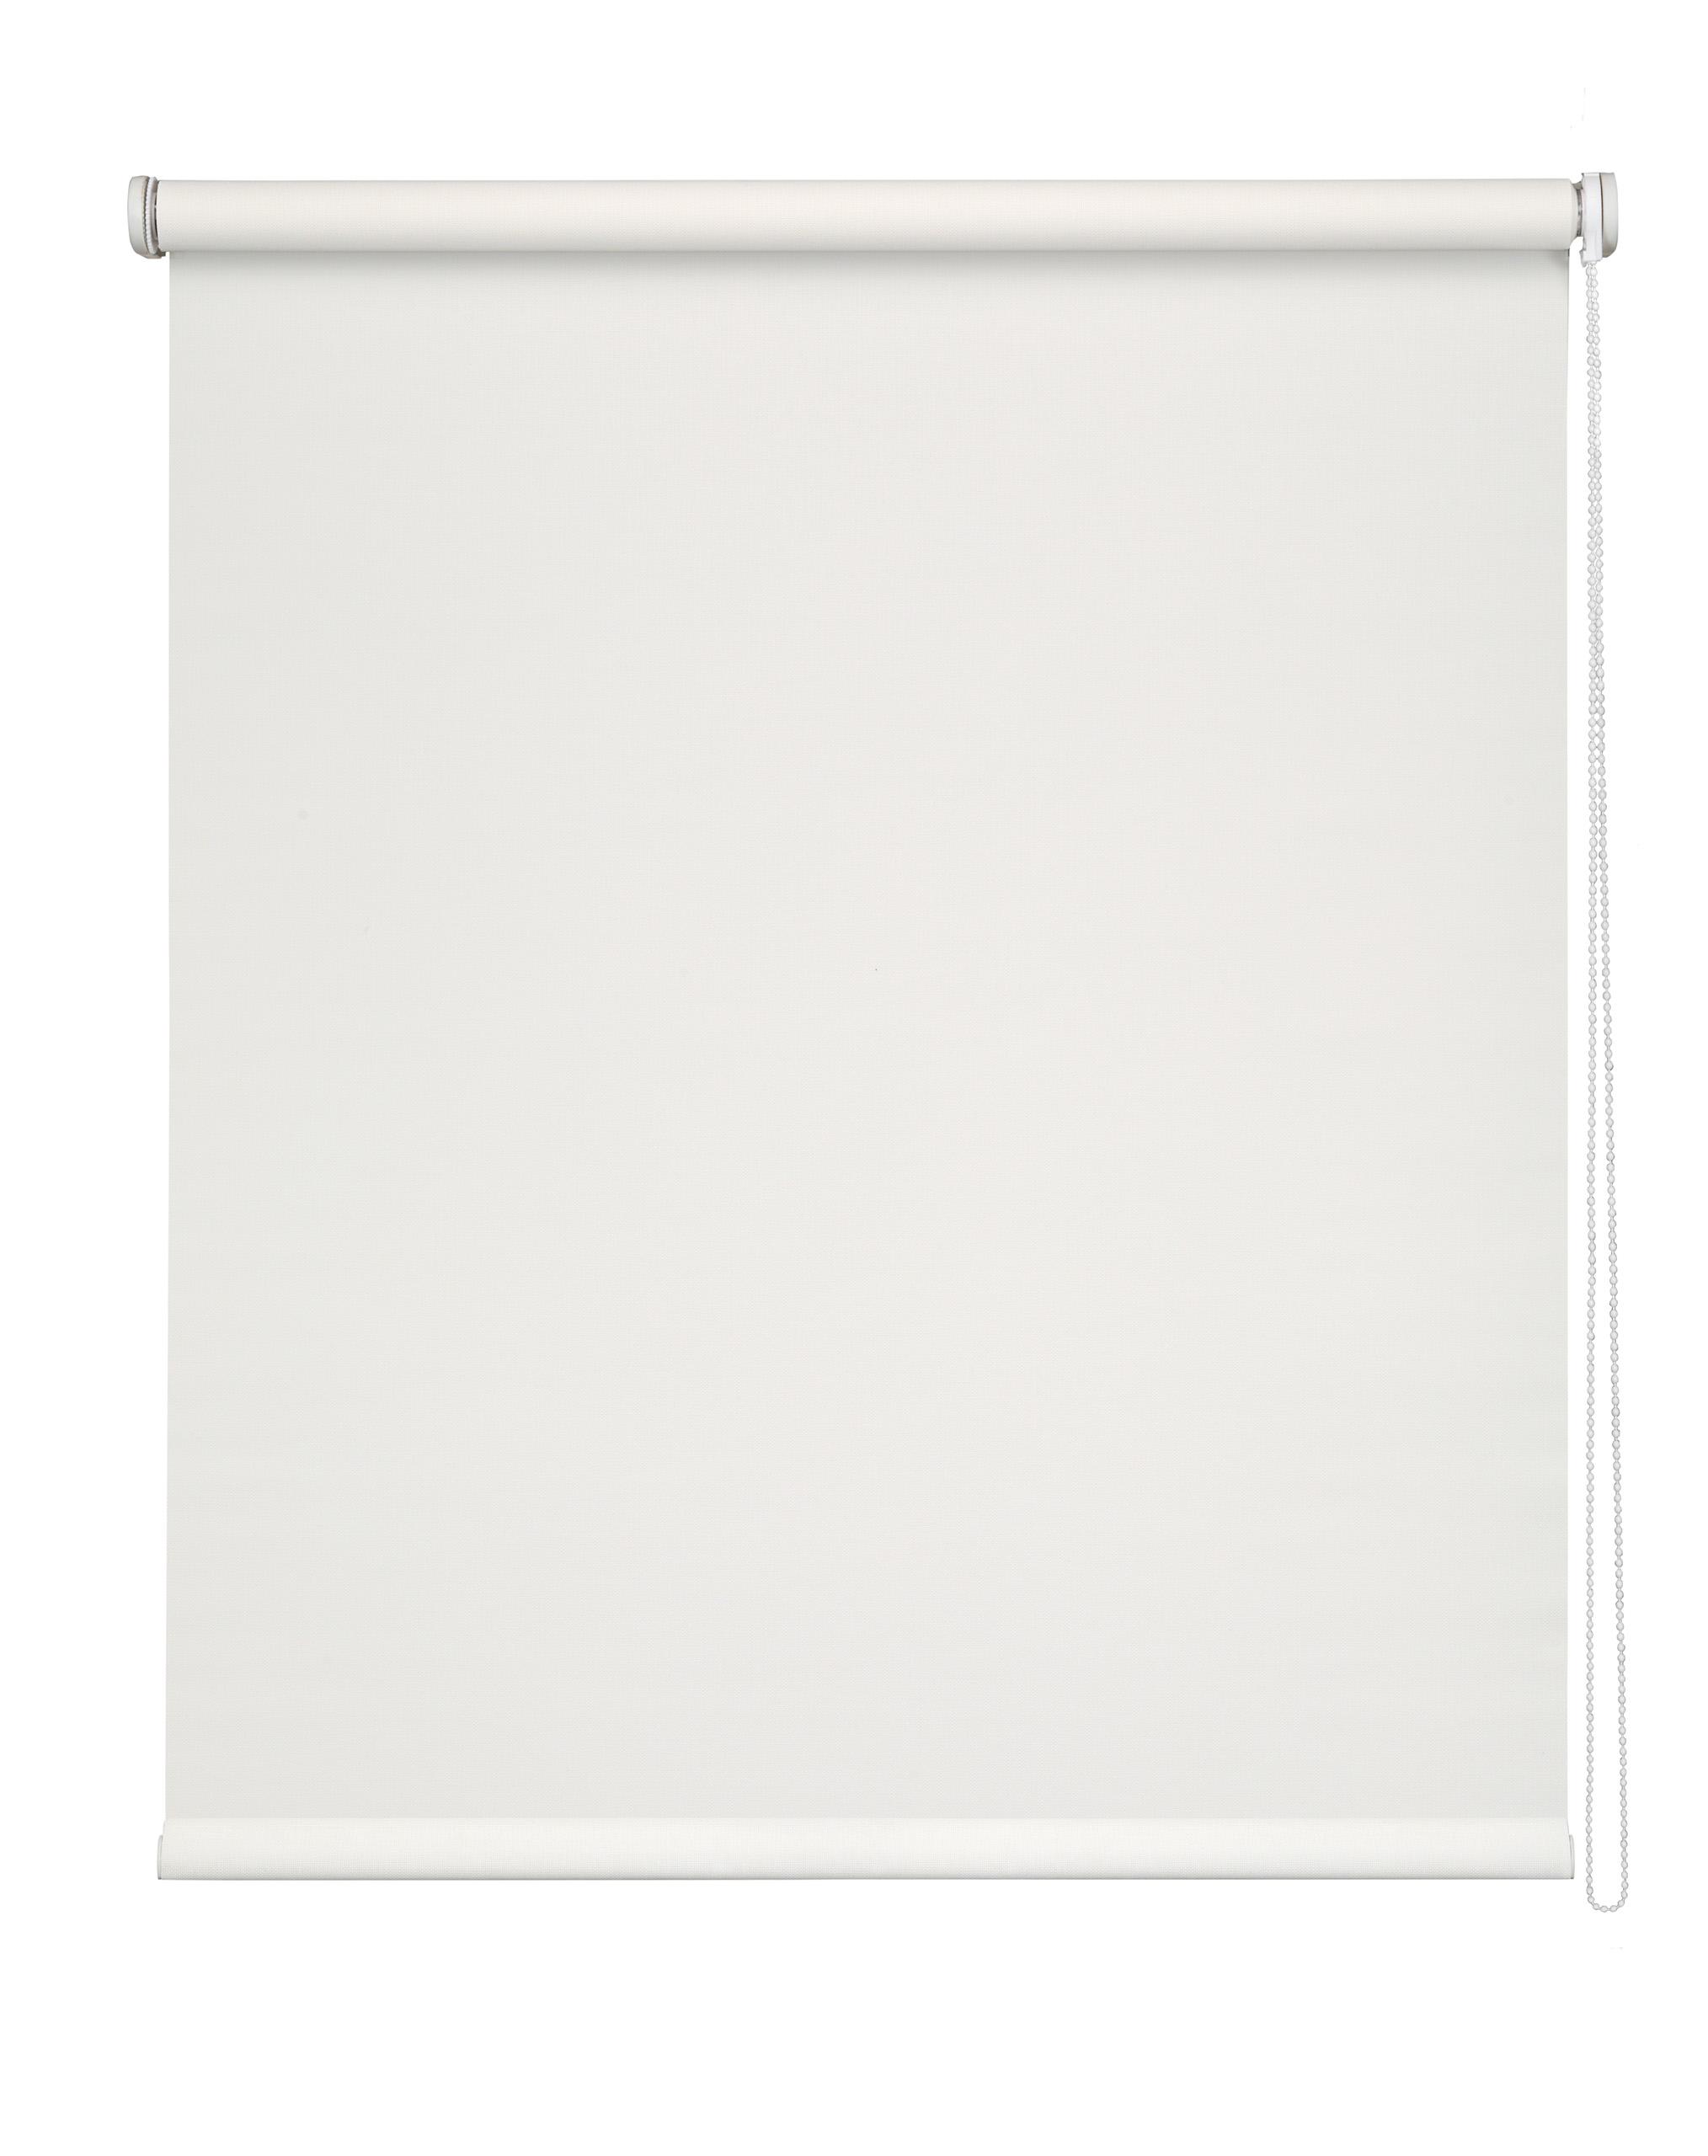 Store Enrouleur voile Screen - Blanc - 165 x 250 cm